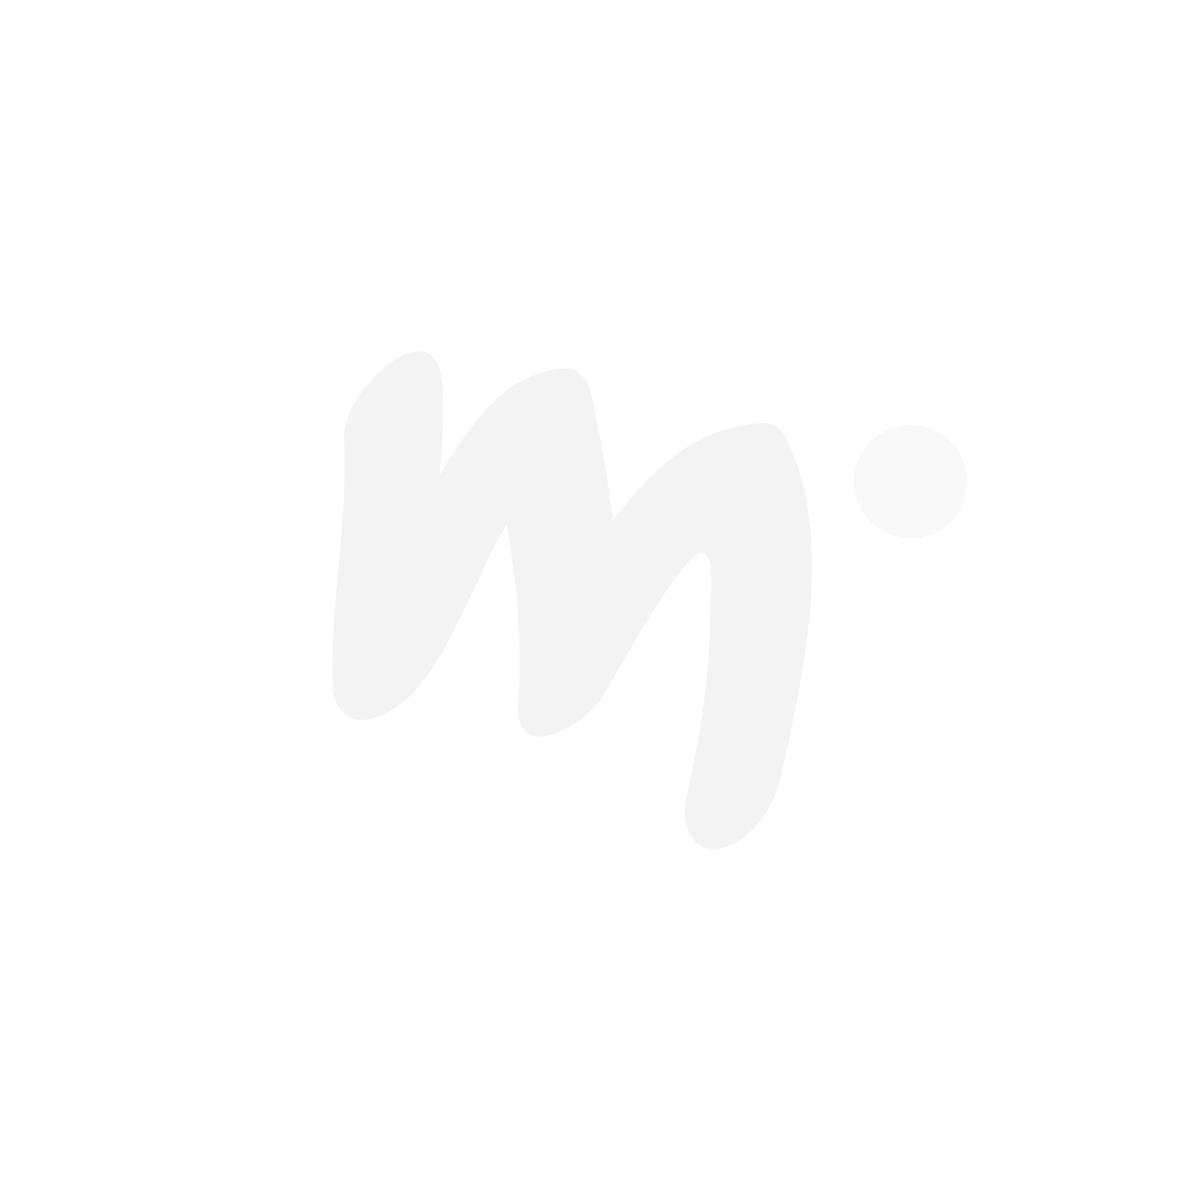 Moomin Little My with Whirls Mug